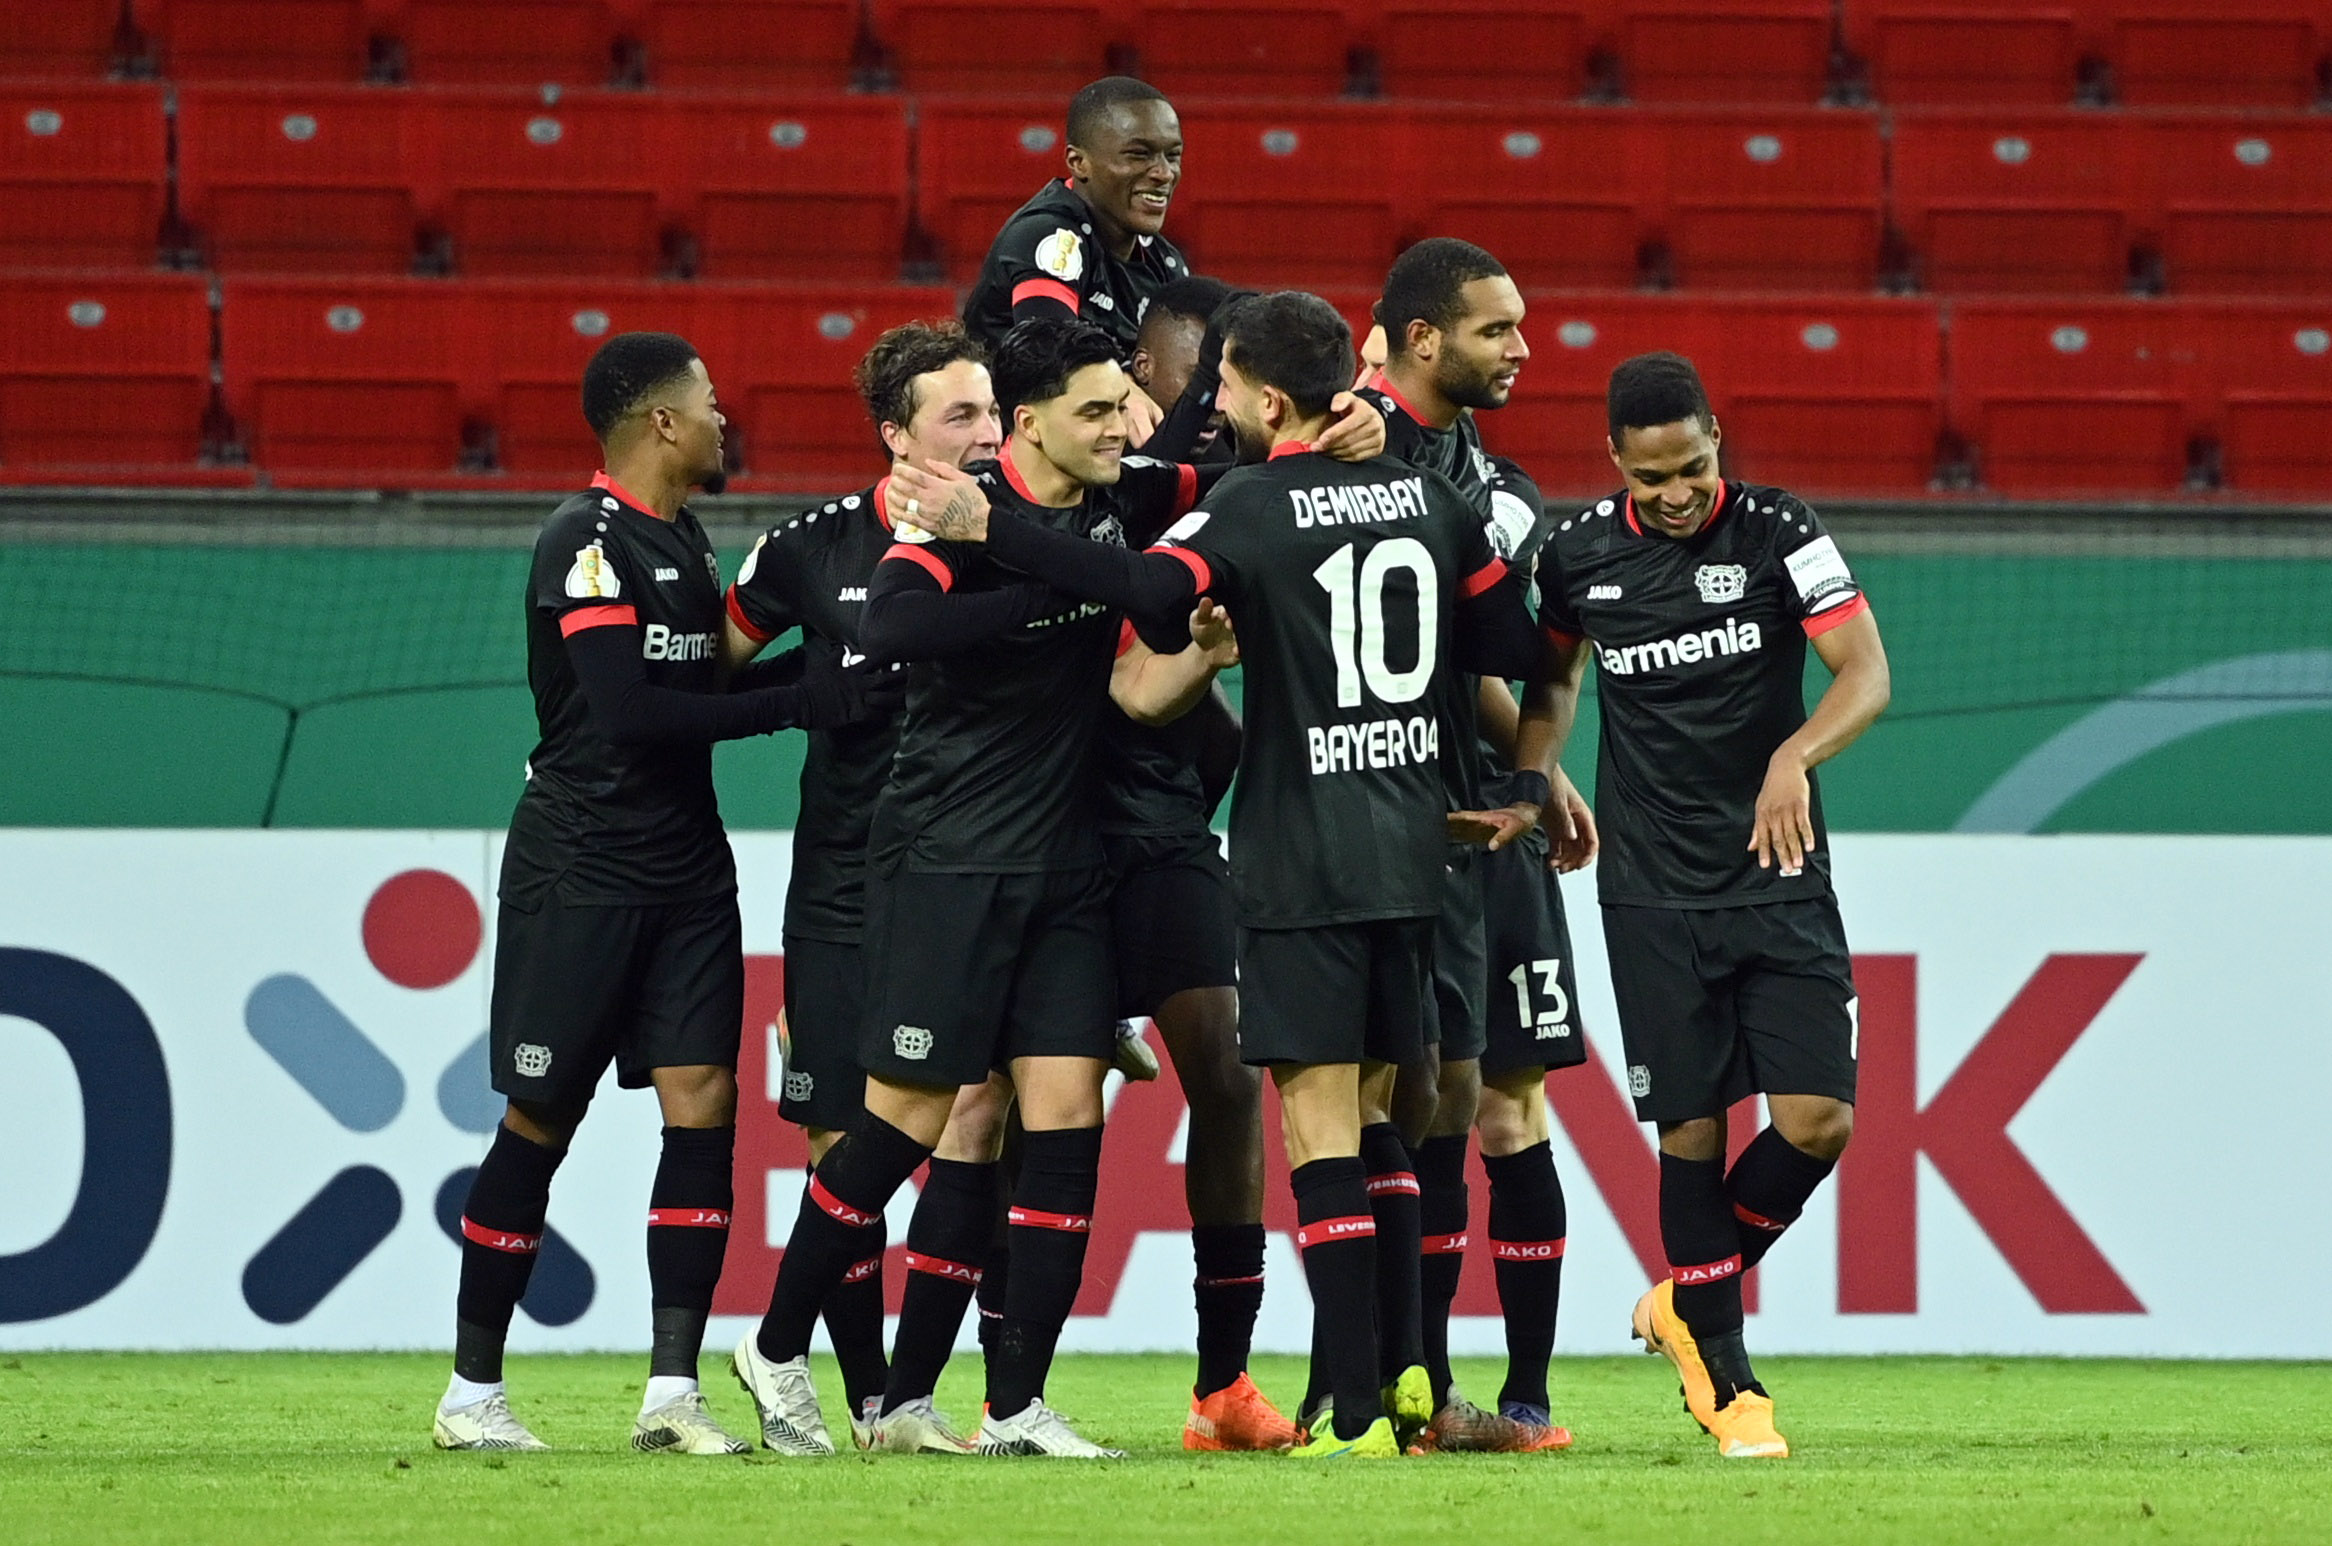 Kύπελλο Γερμανίας: «Ντόρτια» στην Άϊντραχτ και πρόκριση για την Λεβερκούζεν (video)